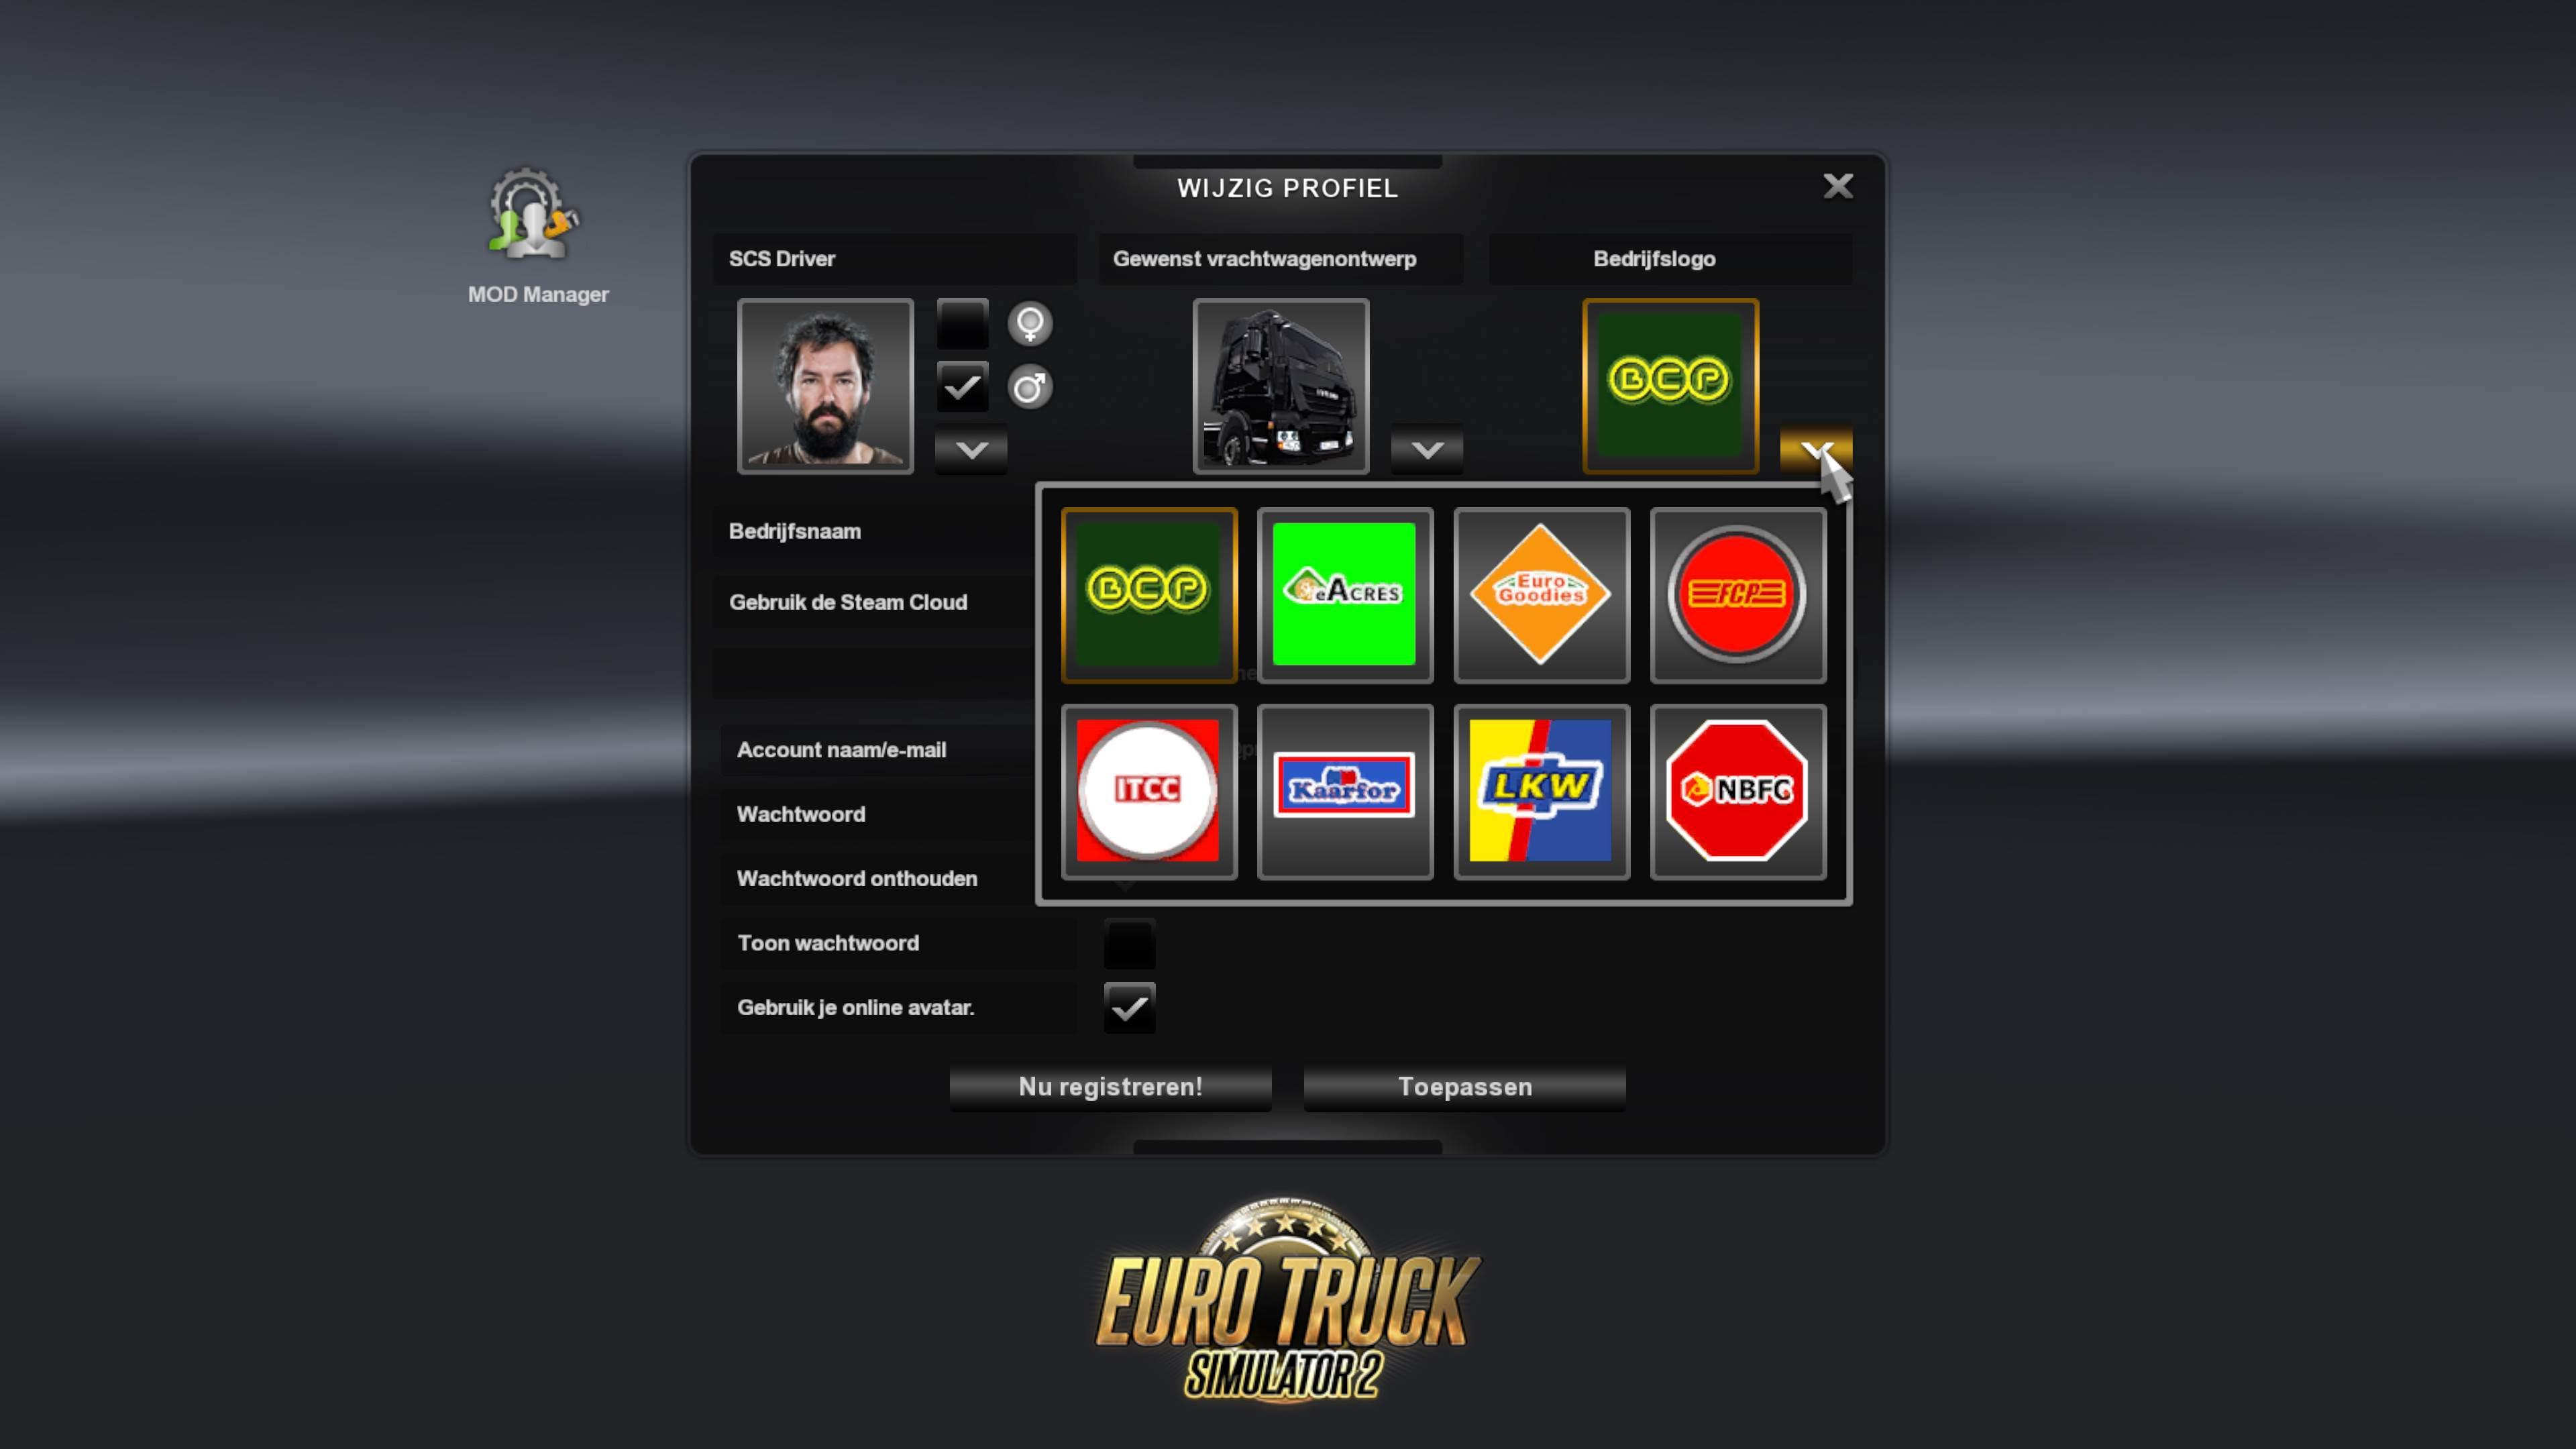 ets2 scs company player logo pack v1 0 1 35 x euro truck simulator 2 mods club euro truck simulator